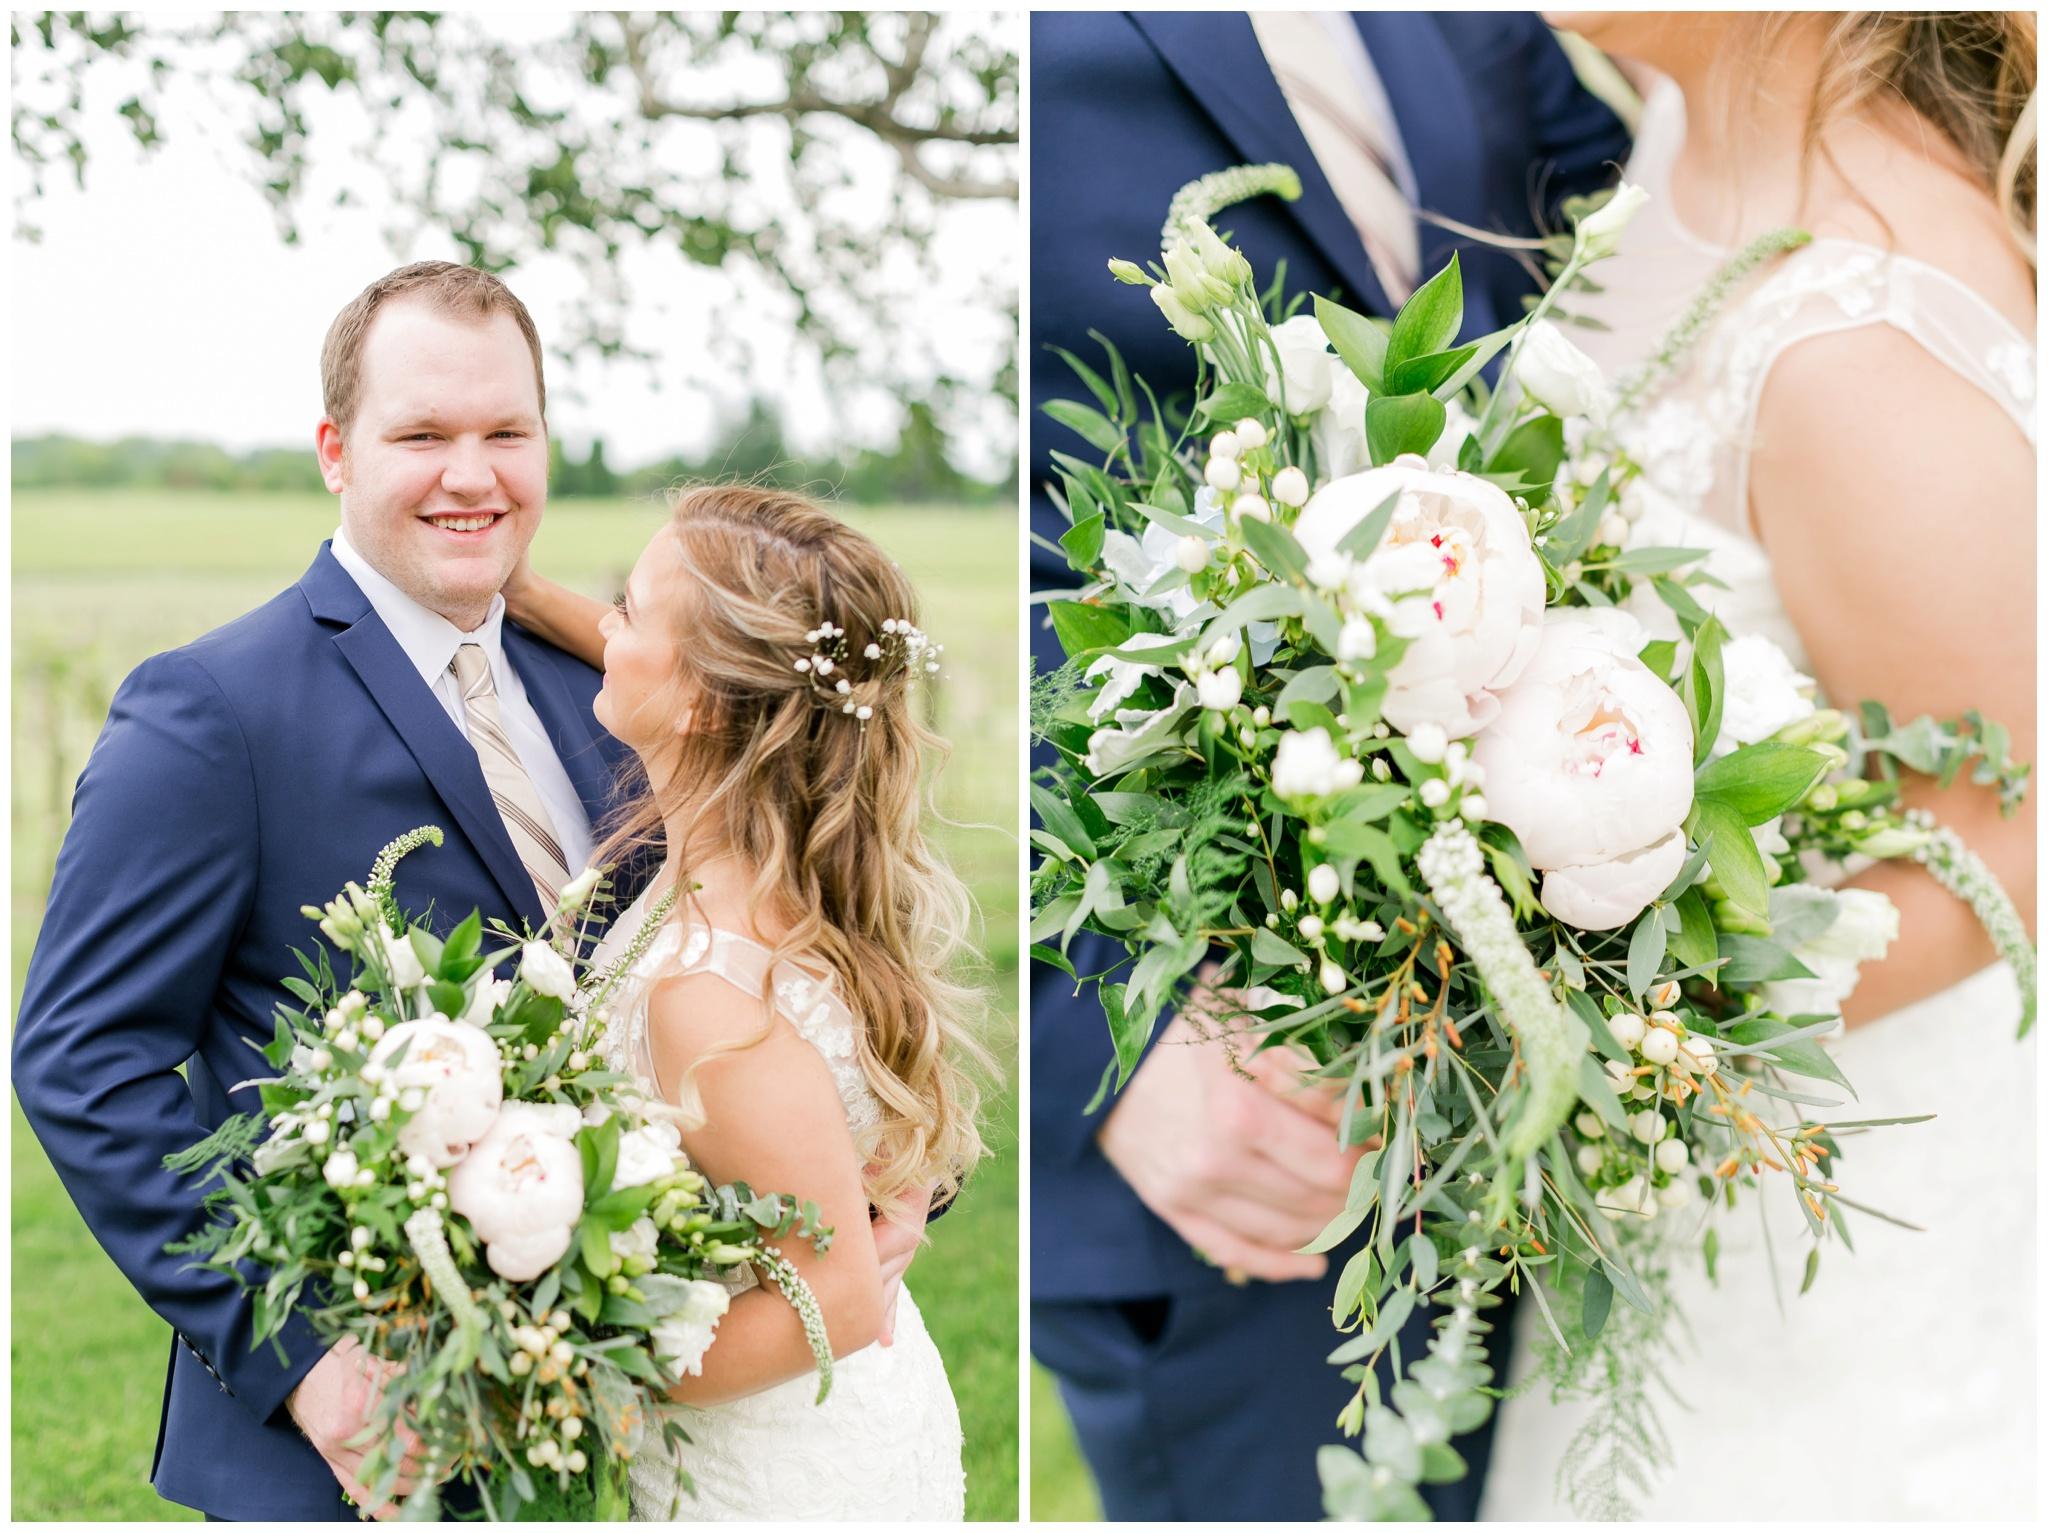 over_the_vines_wedding_edgerton_wisconsin_wedding_caynay_photo_3988.jpg